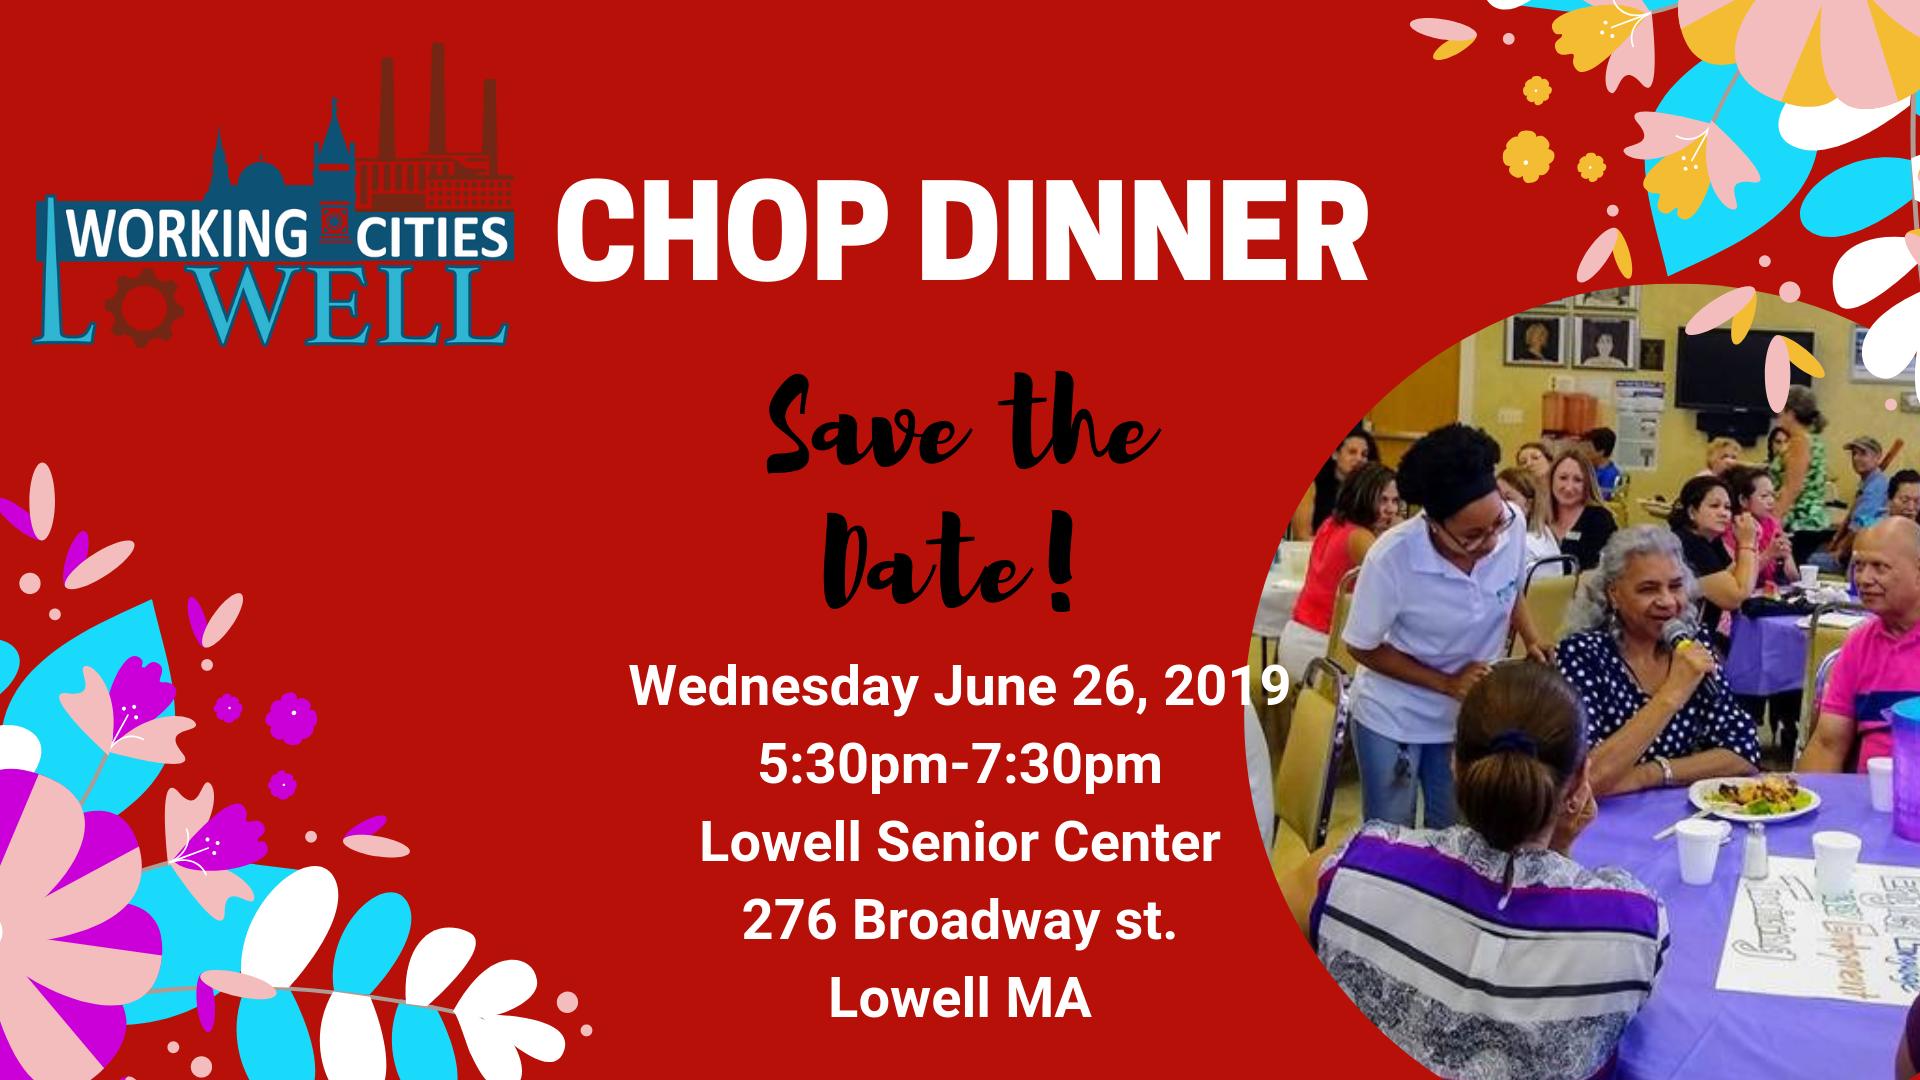 June CHOP Dinner — Working Cities Lowell Initative